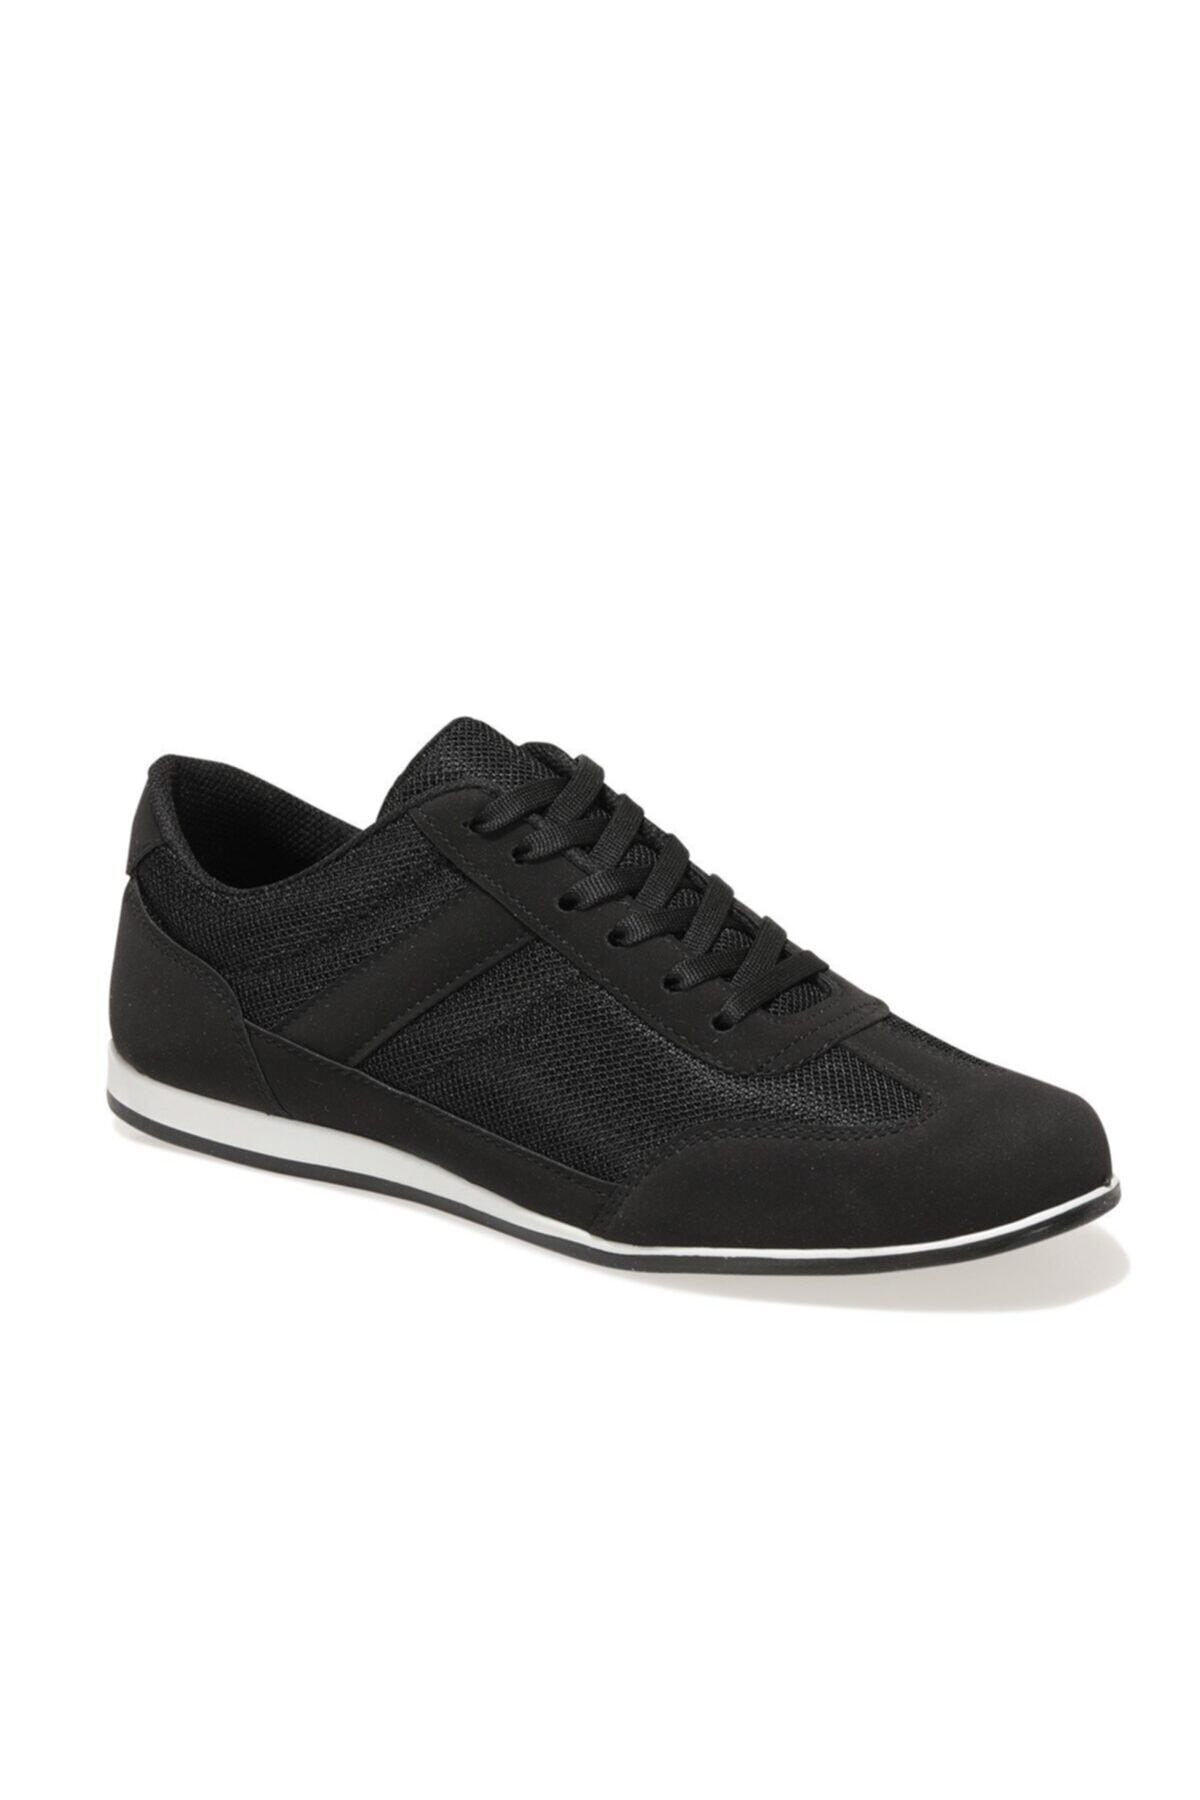 356742.M1FX Siyah Erkek Sneaker Ayakkabı 100936368